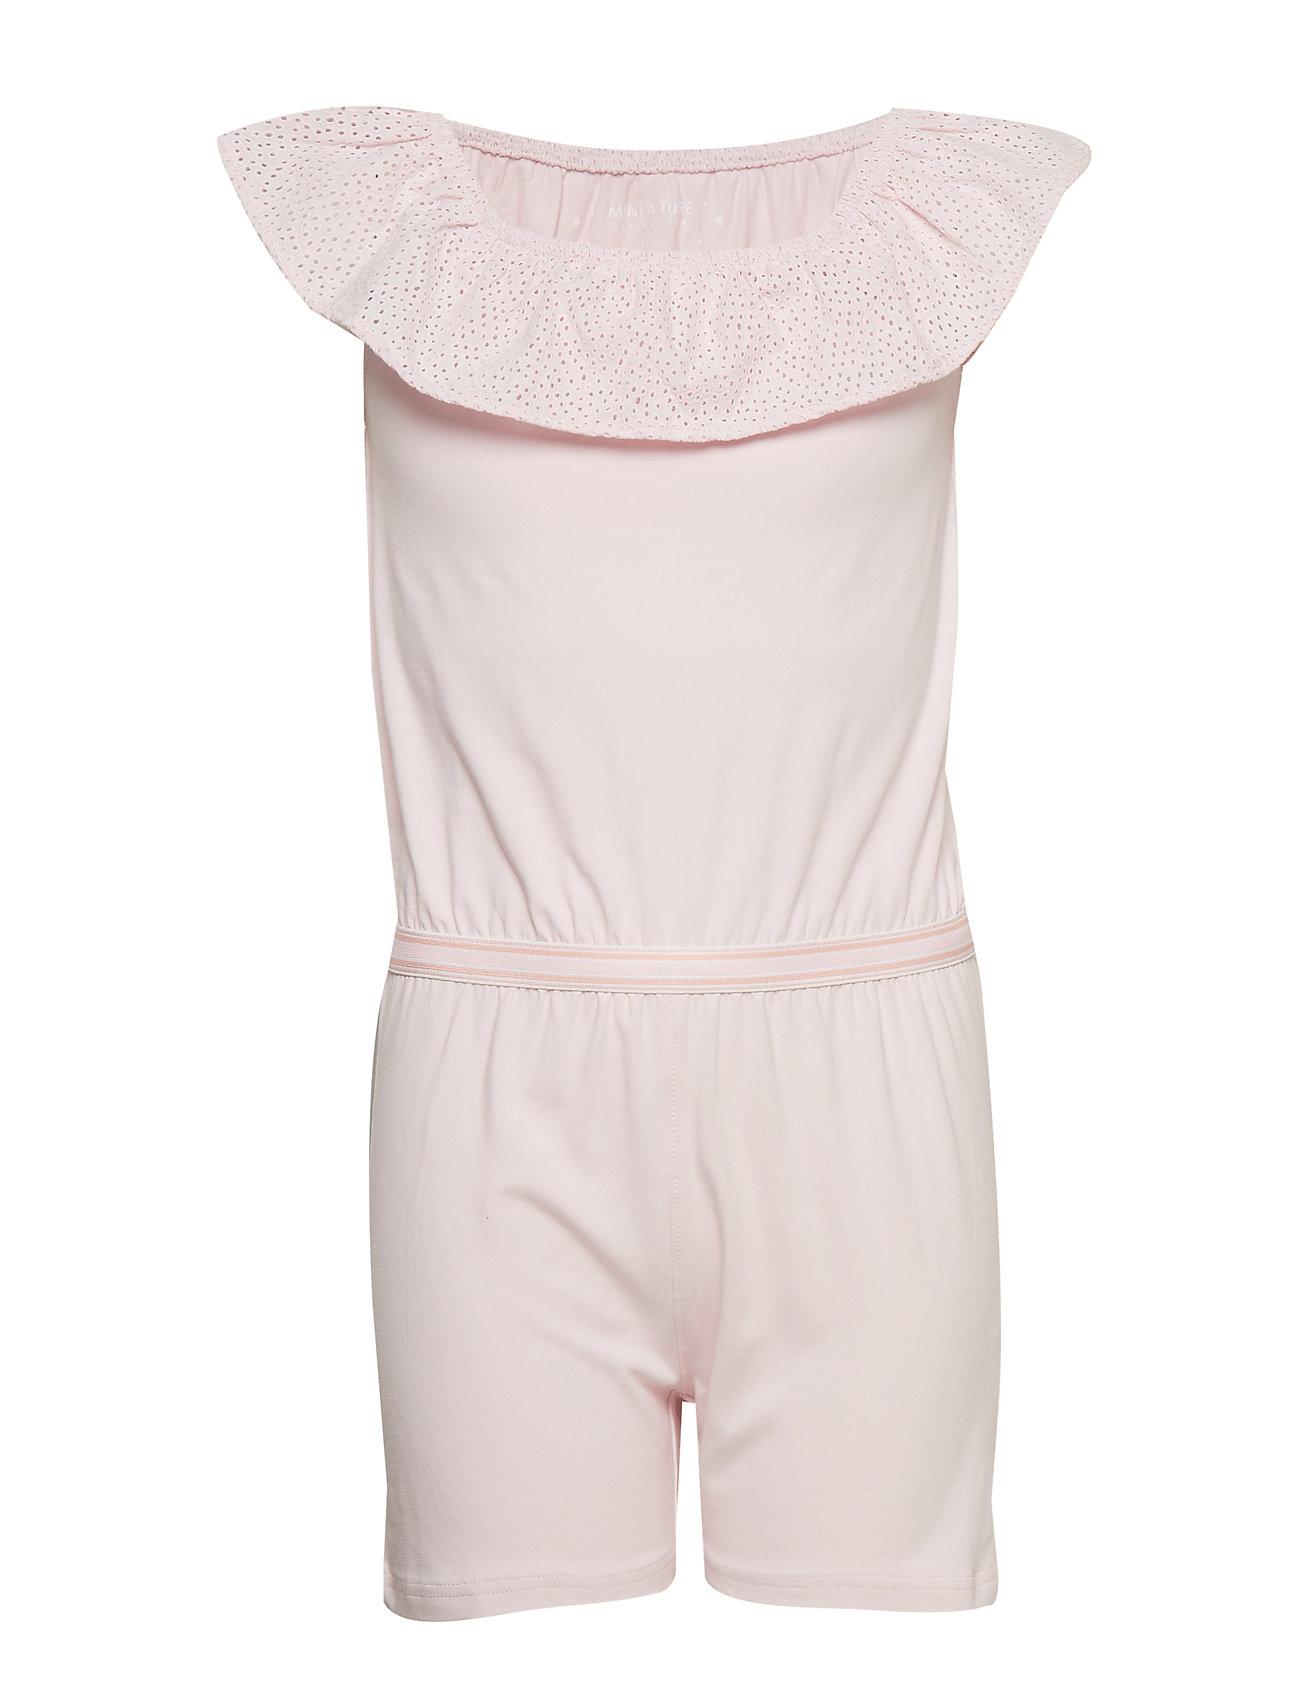 Mini A Ture Monik Suit, K - BLUSHING PINK